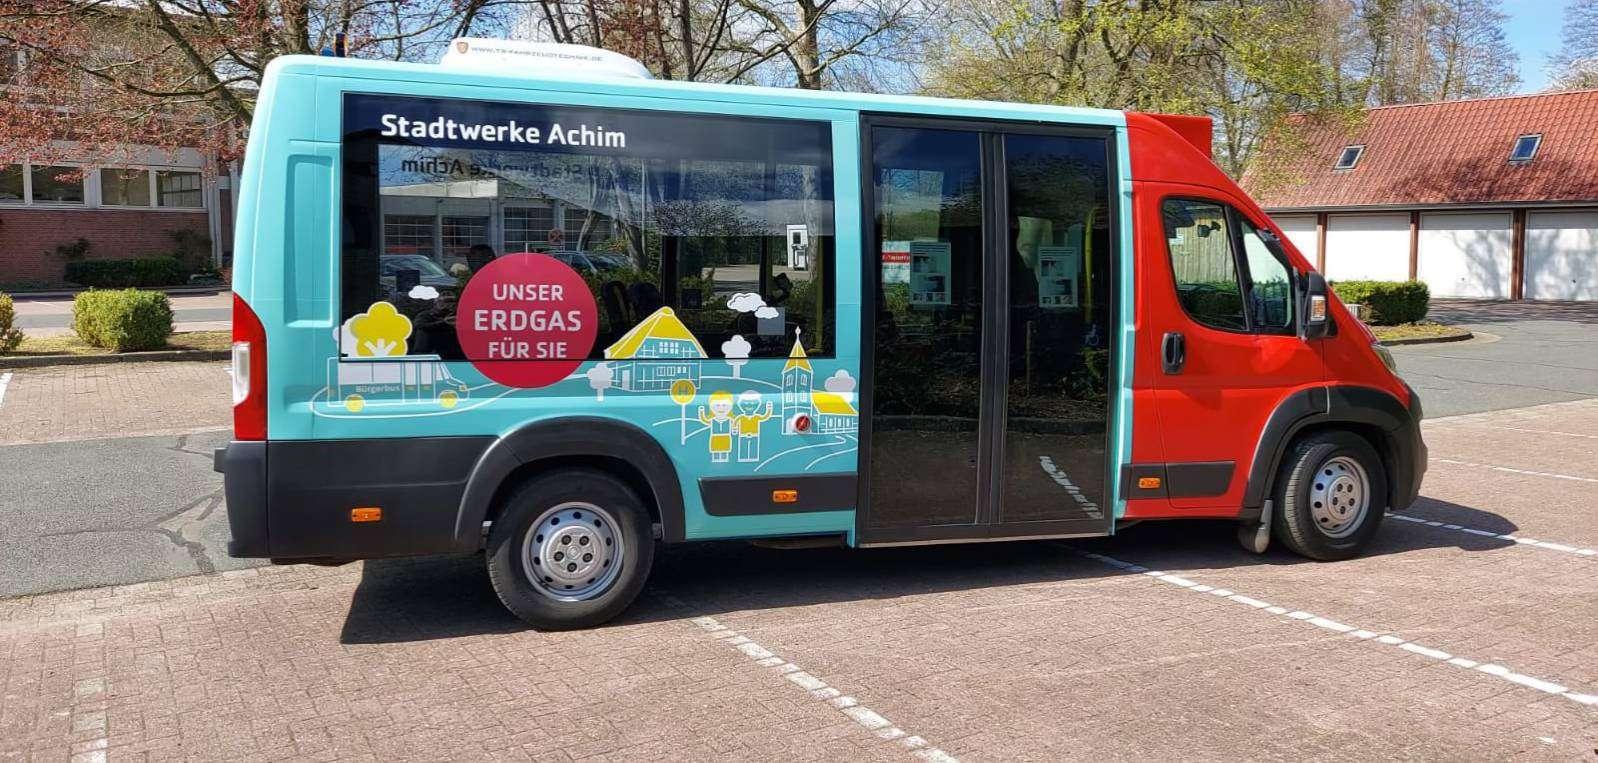 Einer der Ottersberger Bürgerbusse kommt bereits in neuem Gewand daher.